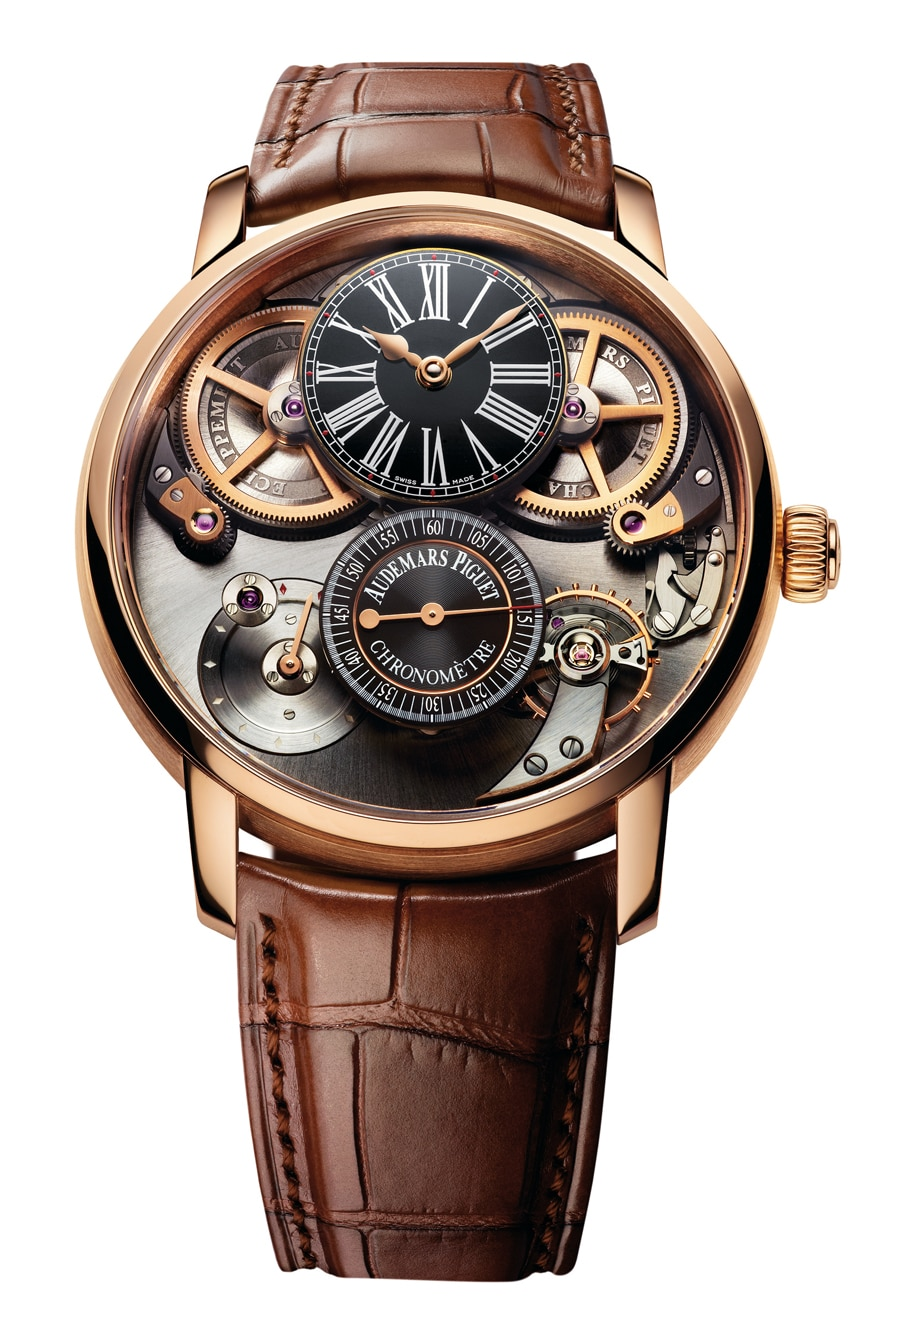 Audemars Piguet: Jules Audemars Chronometer, 46 Millimeter, Roségold, 209.700 Euro